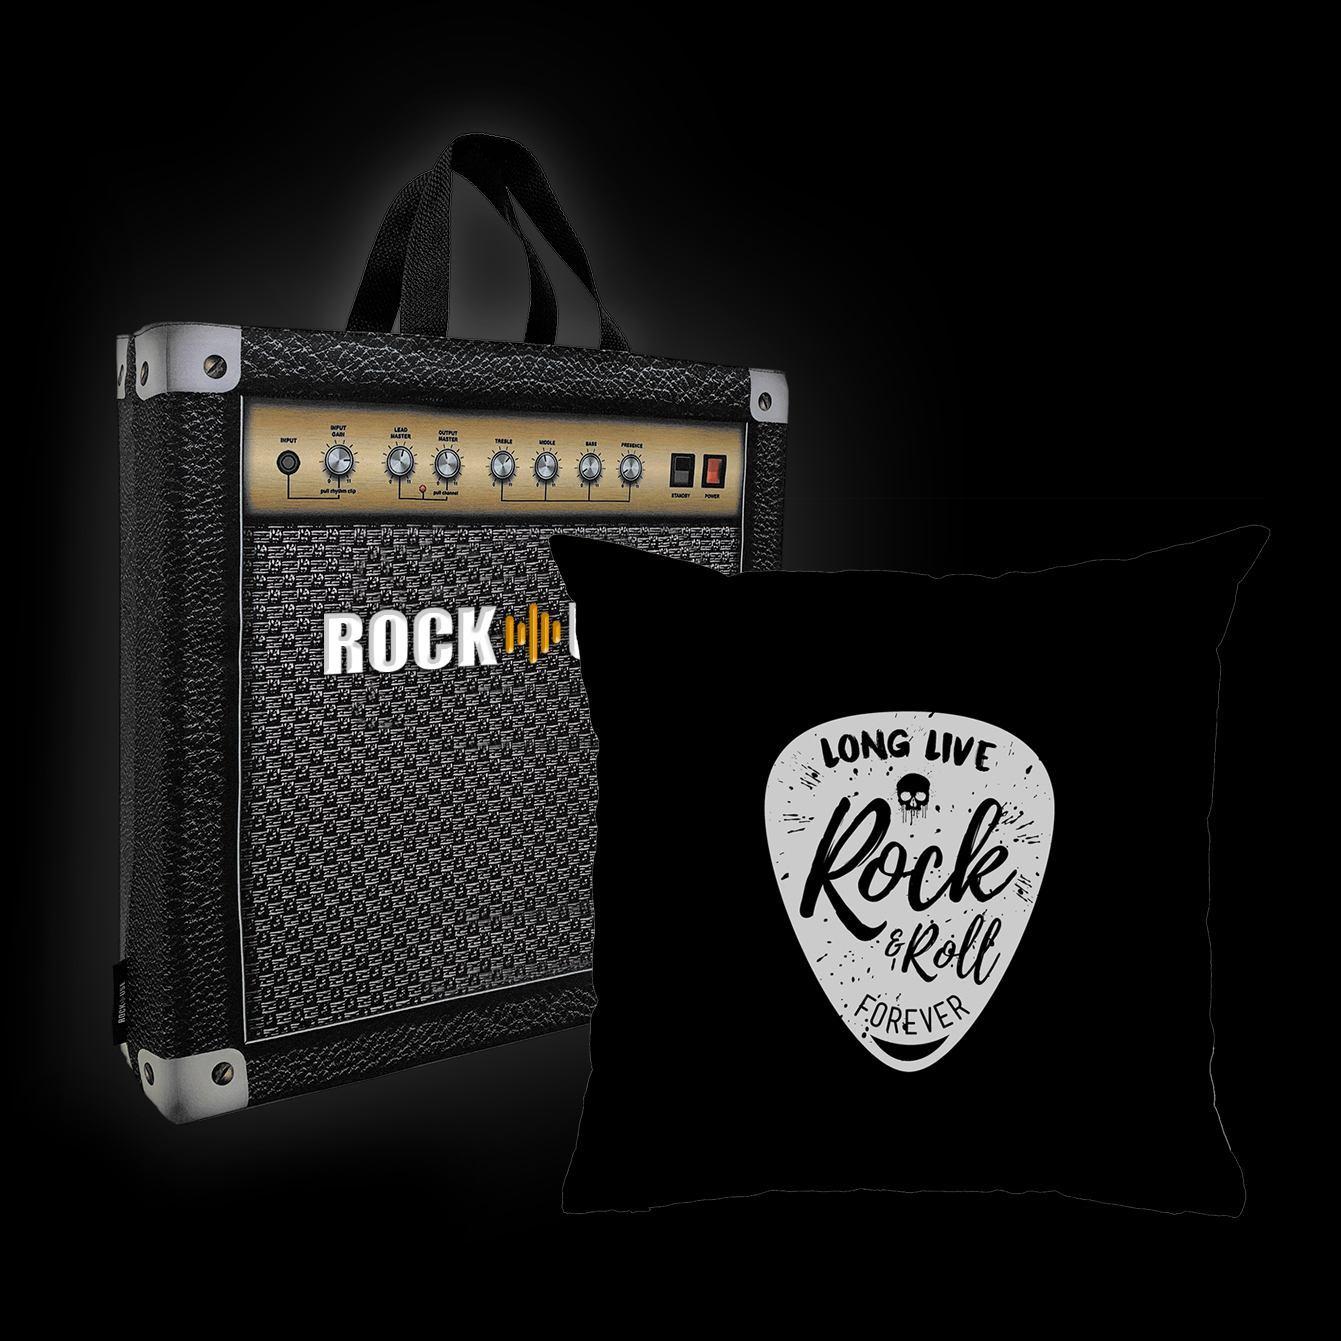 Kit Almofada & Sacola Rock Use - Long Live Rock & Roll - Preta